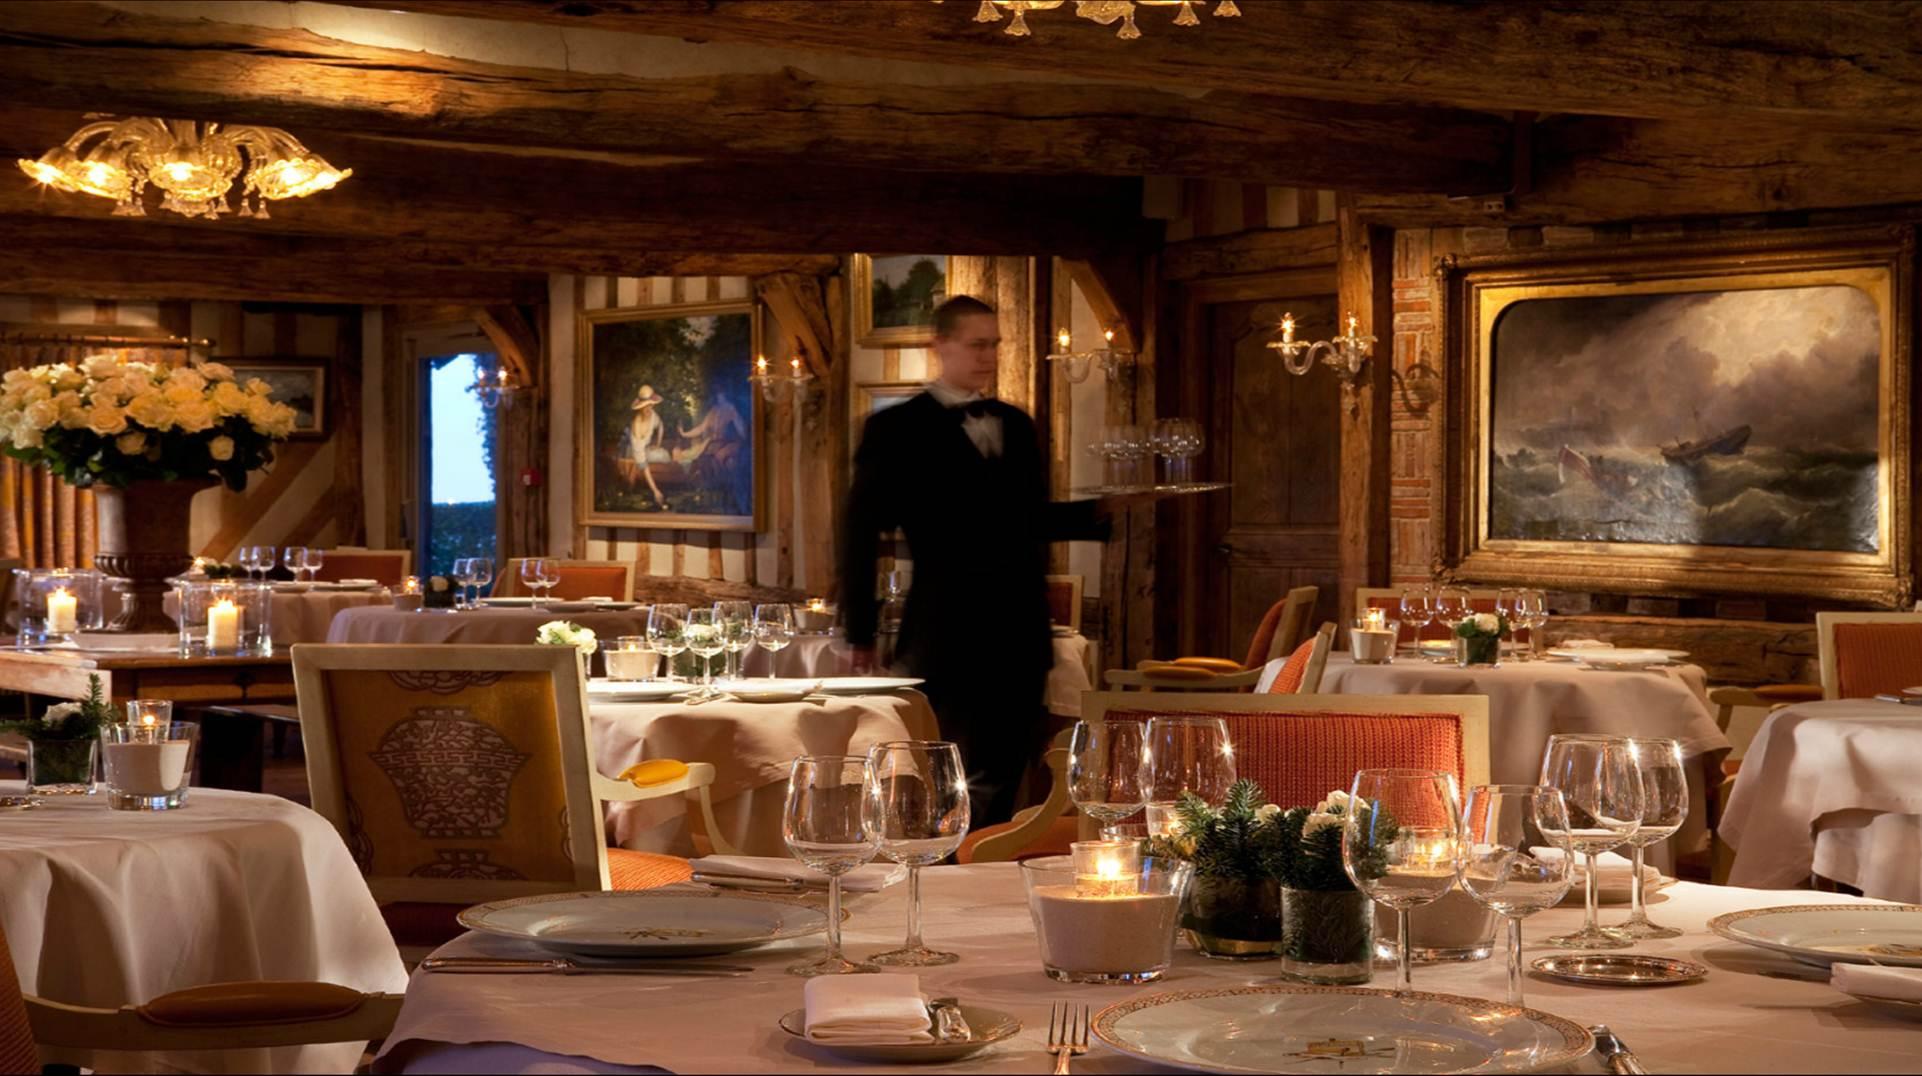 ferme-saint-simeon-hotel-veronese-4